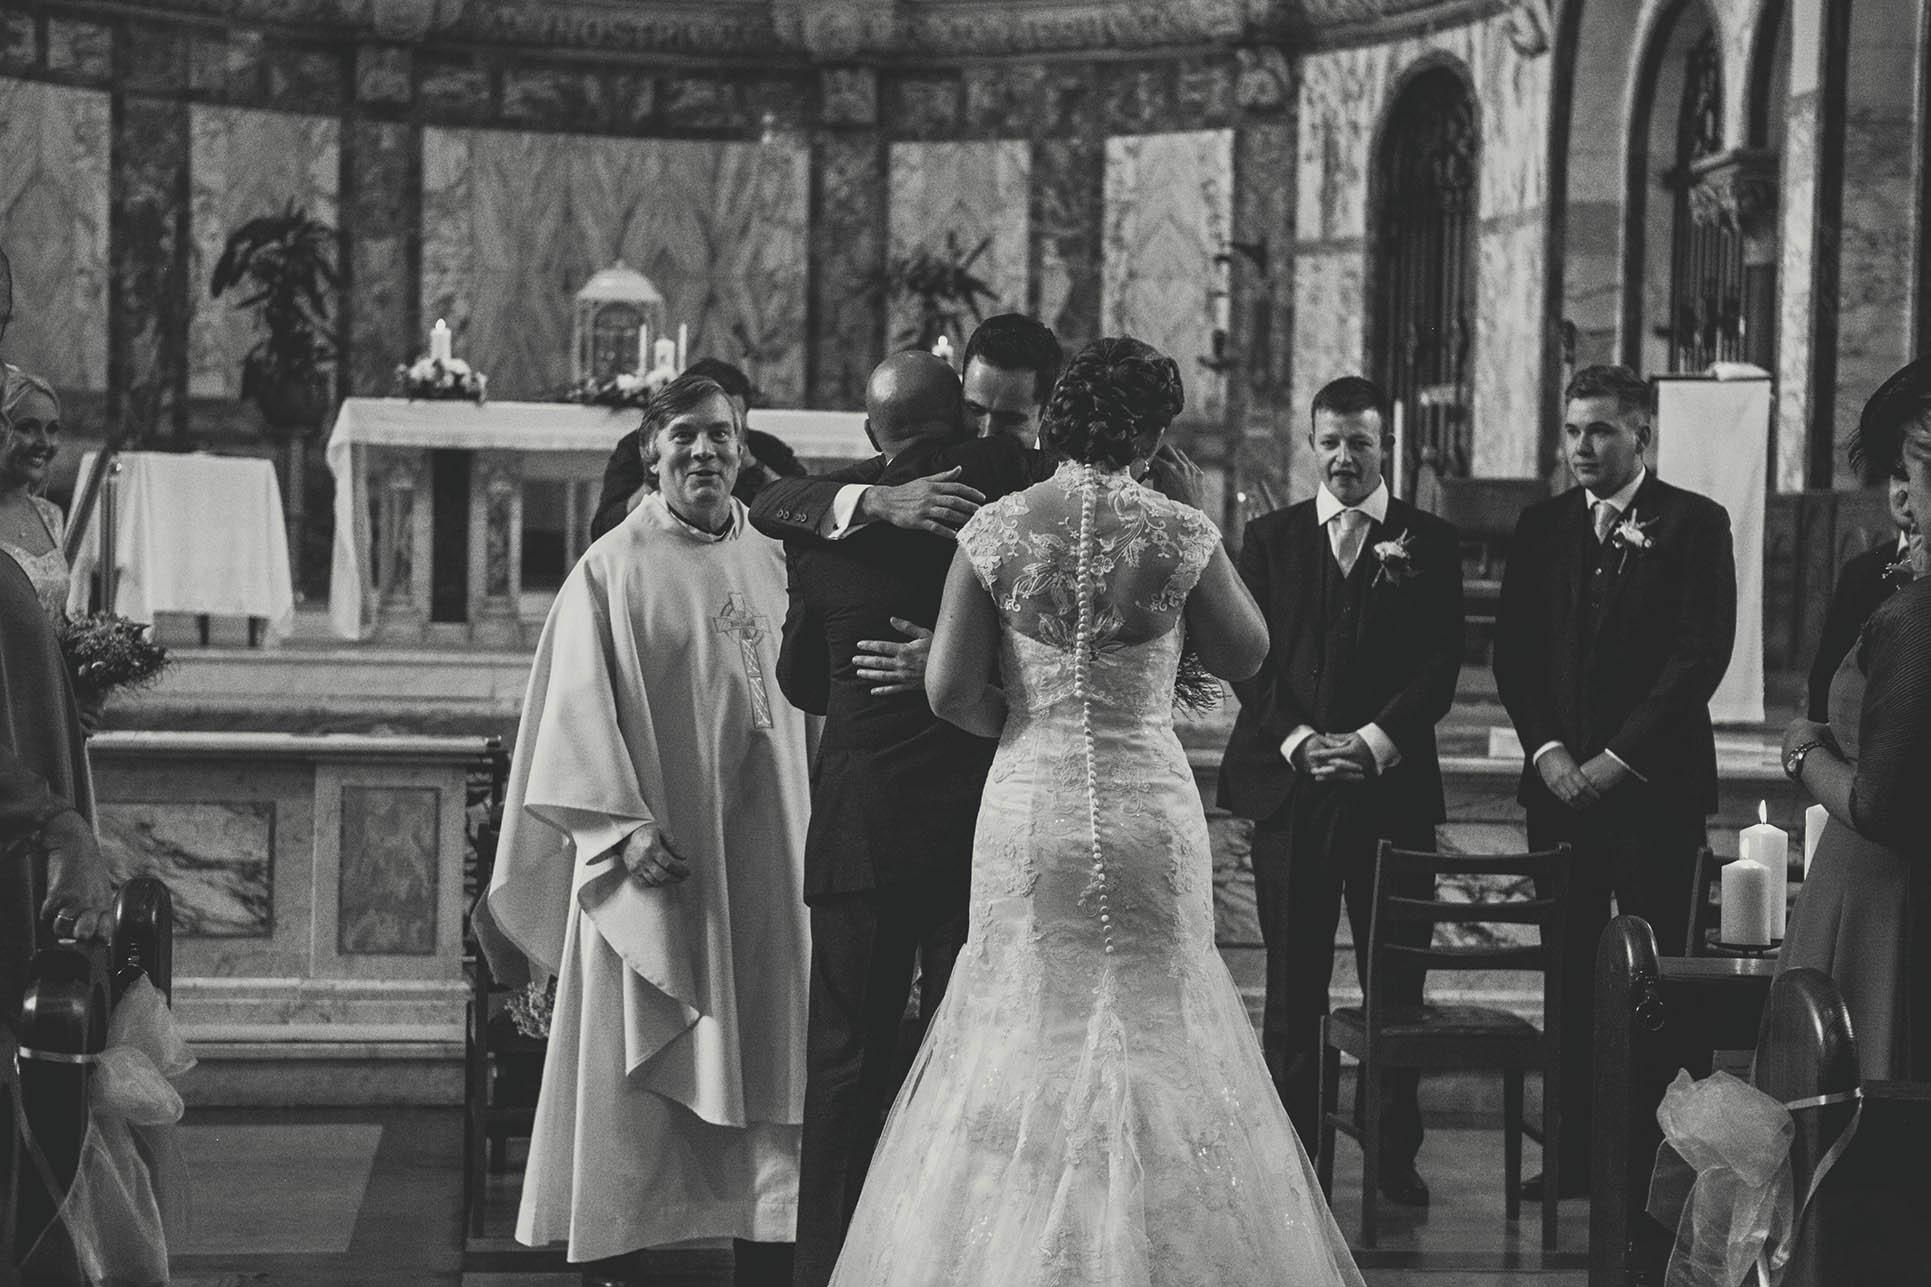 Druids Glen wedding service 2014